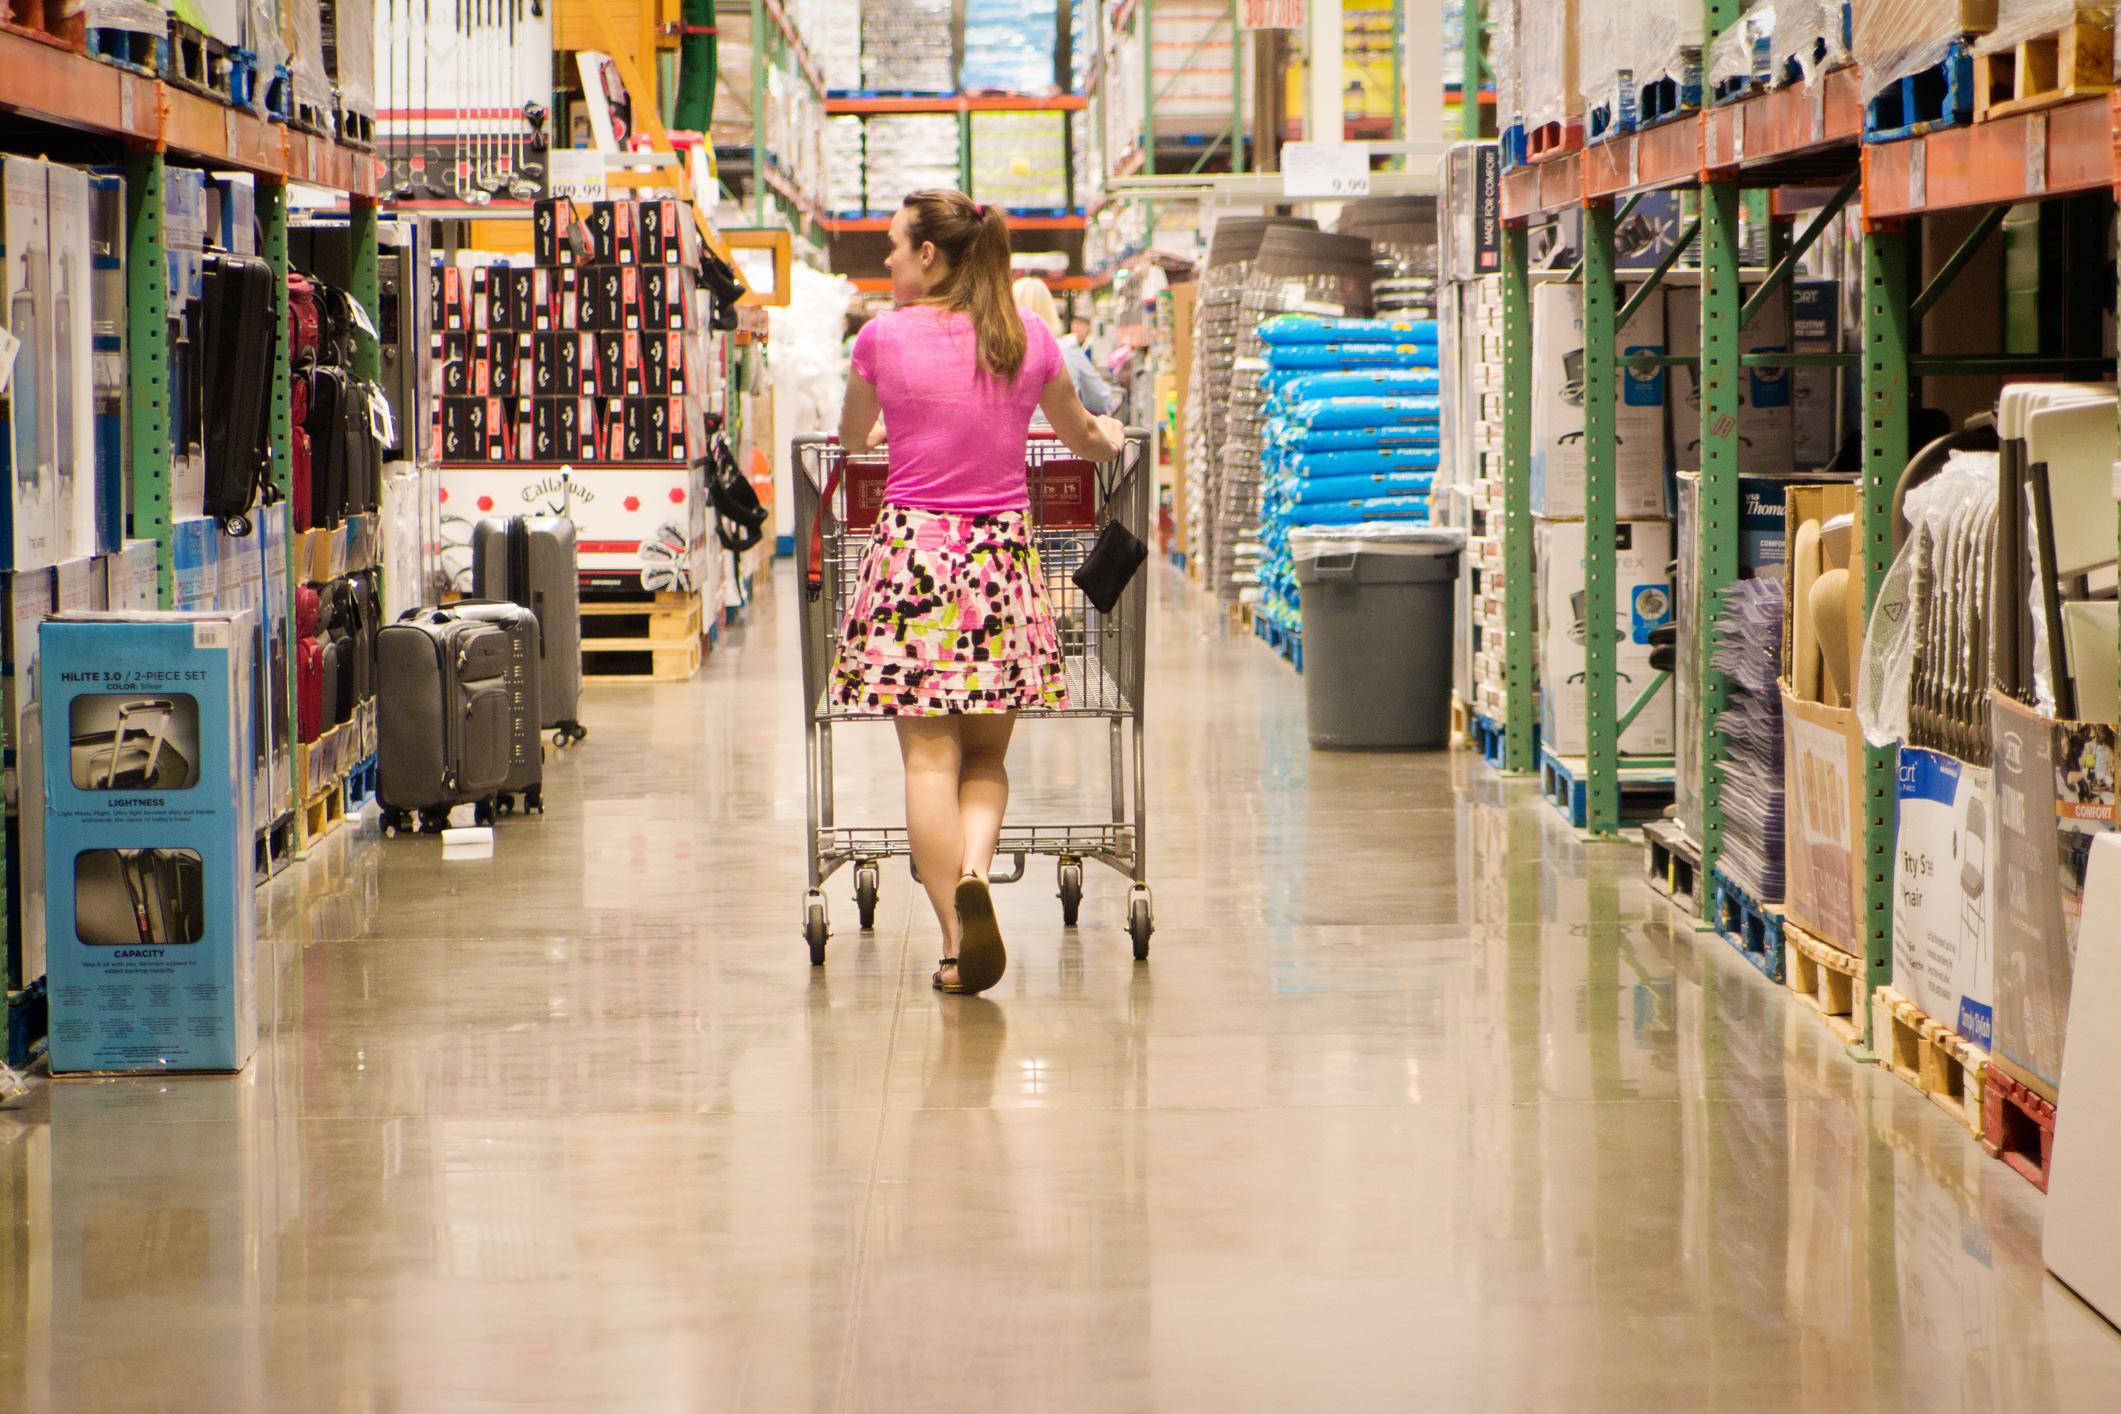 A customer browses through a warehouse aisle.